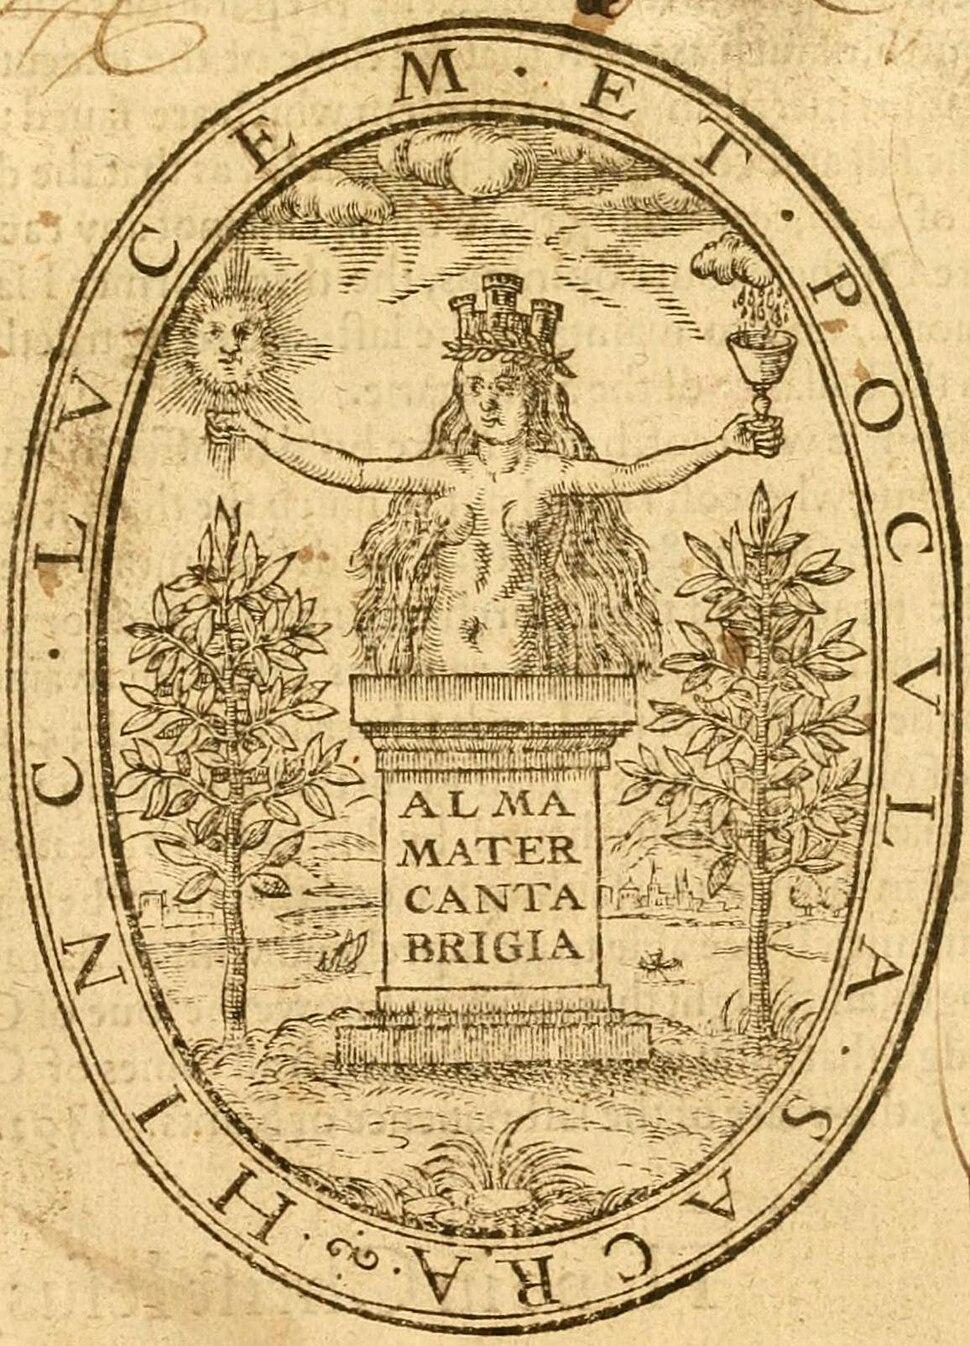 Legate John, Alma Mater Cantabrigia Emblem 1600 (Golden Chaine print).jpg